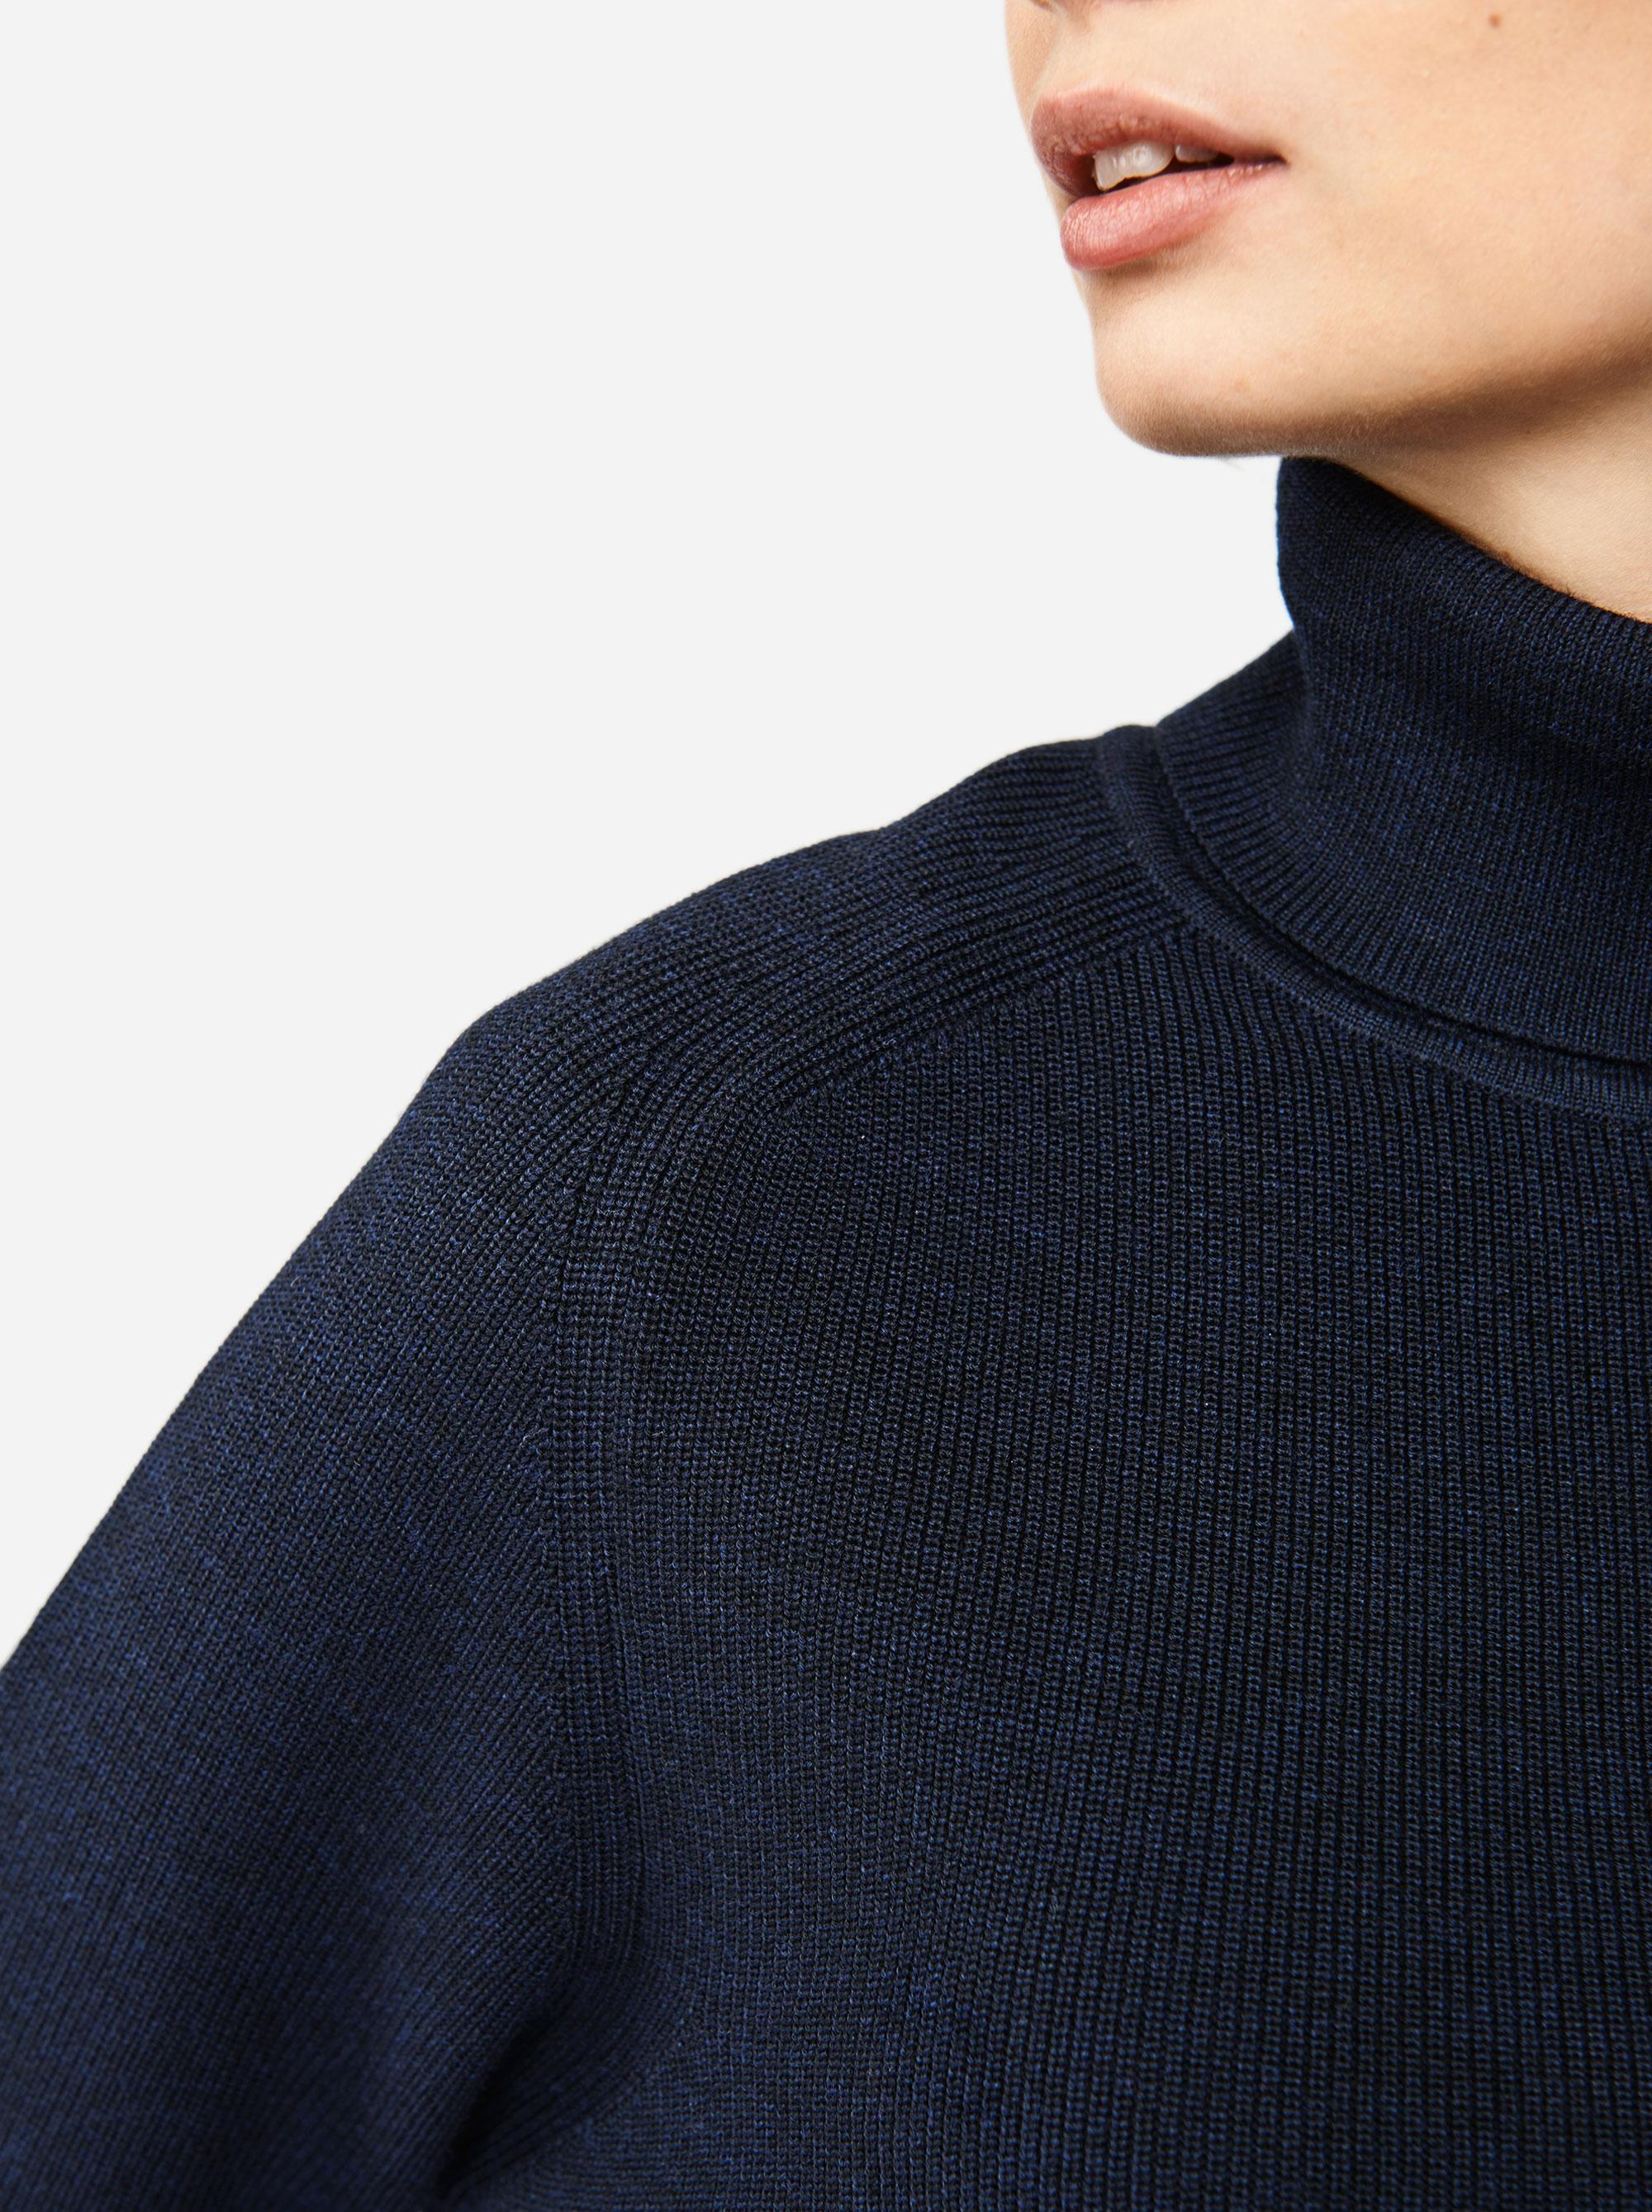 Teym - Turtleneck - The Merino Sweater - Men - Blue - 3